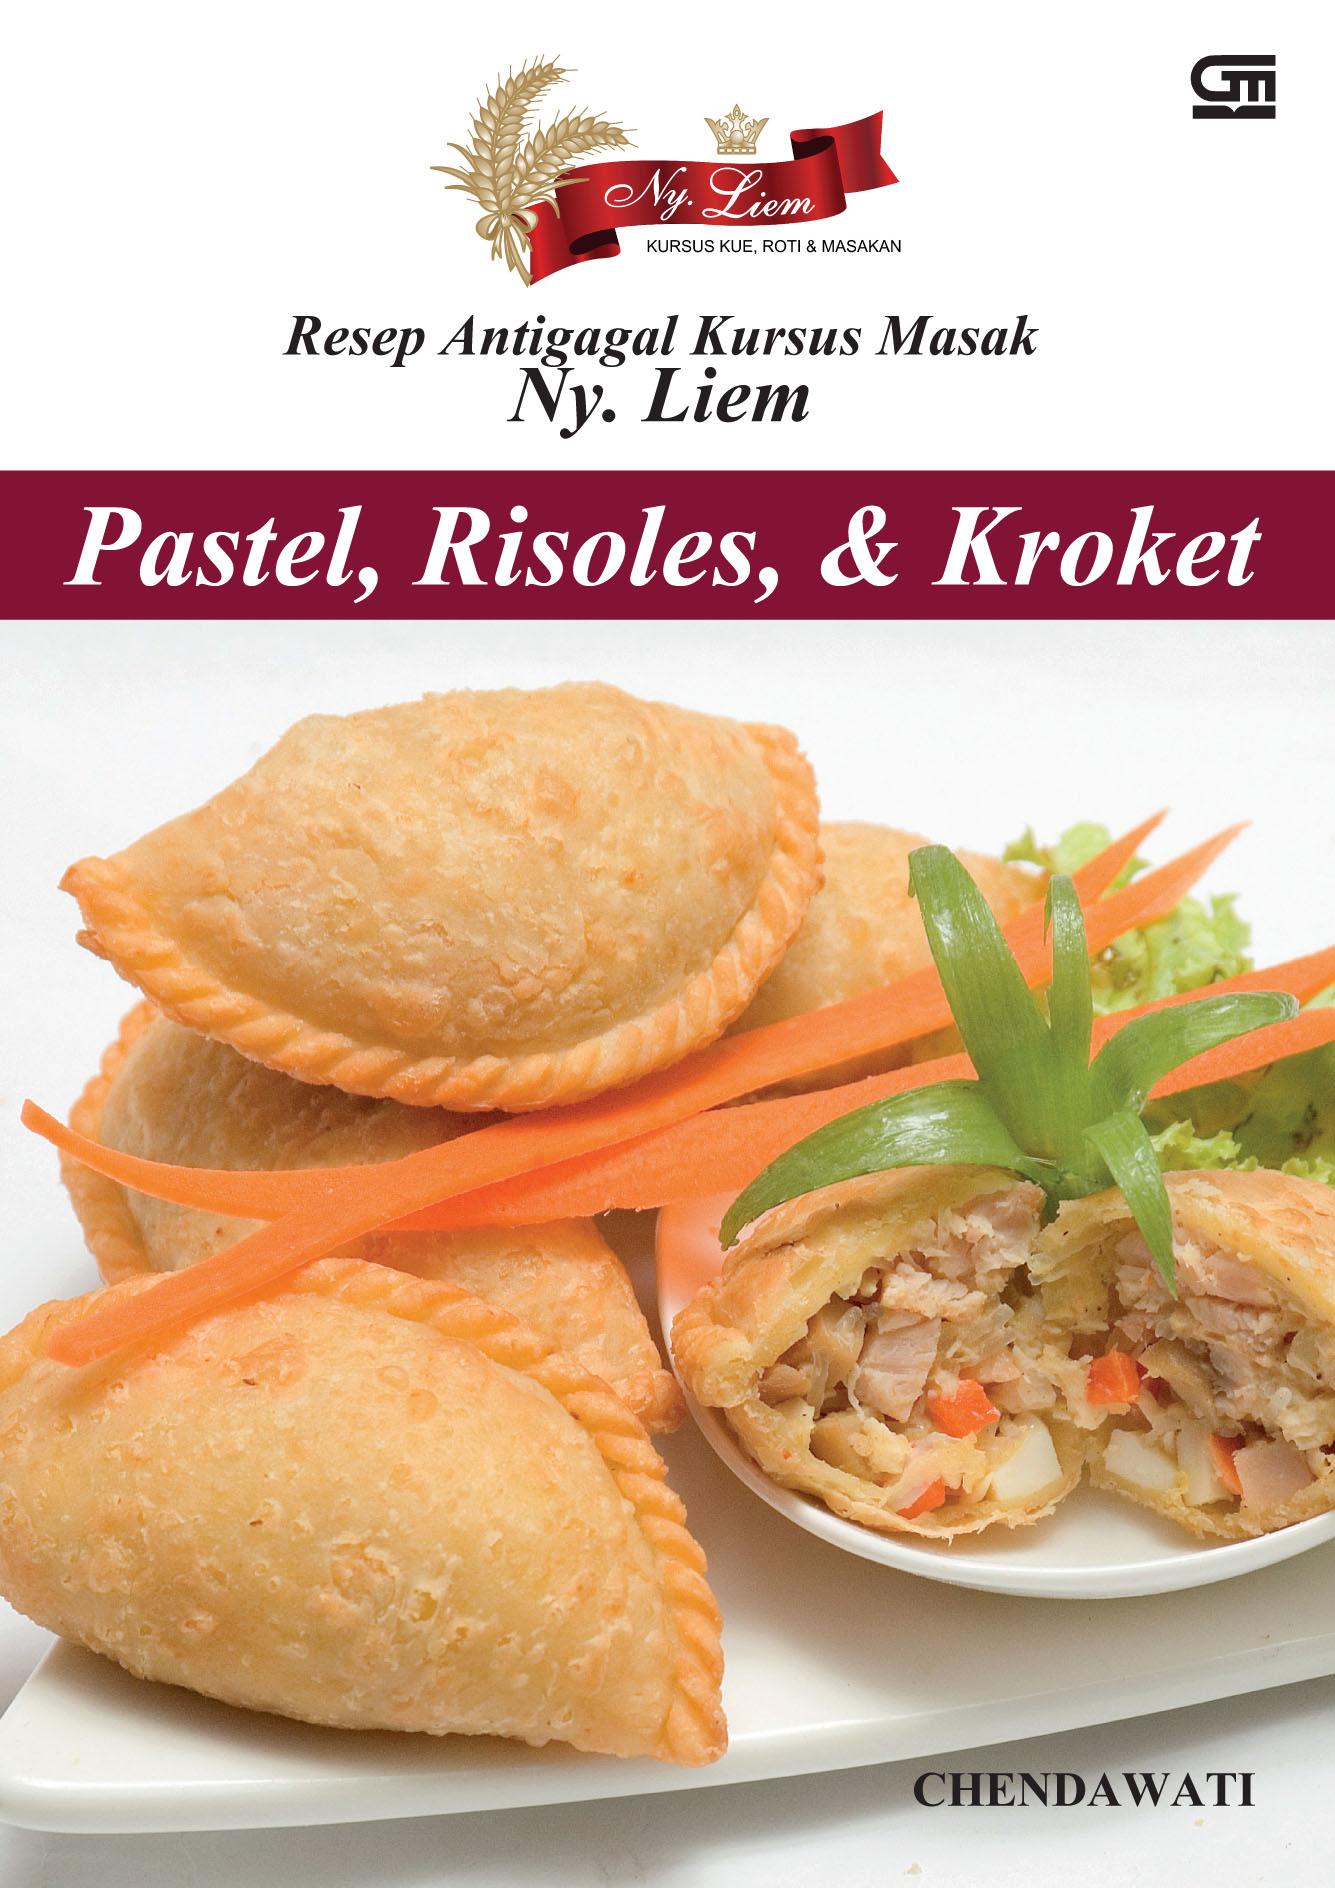 Resep Antigagal Kursus Masak Ny. Liem; Pastel, Risoles, & Kroket (Ed. Revisi)